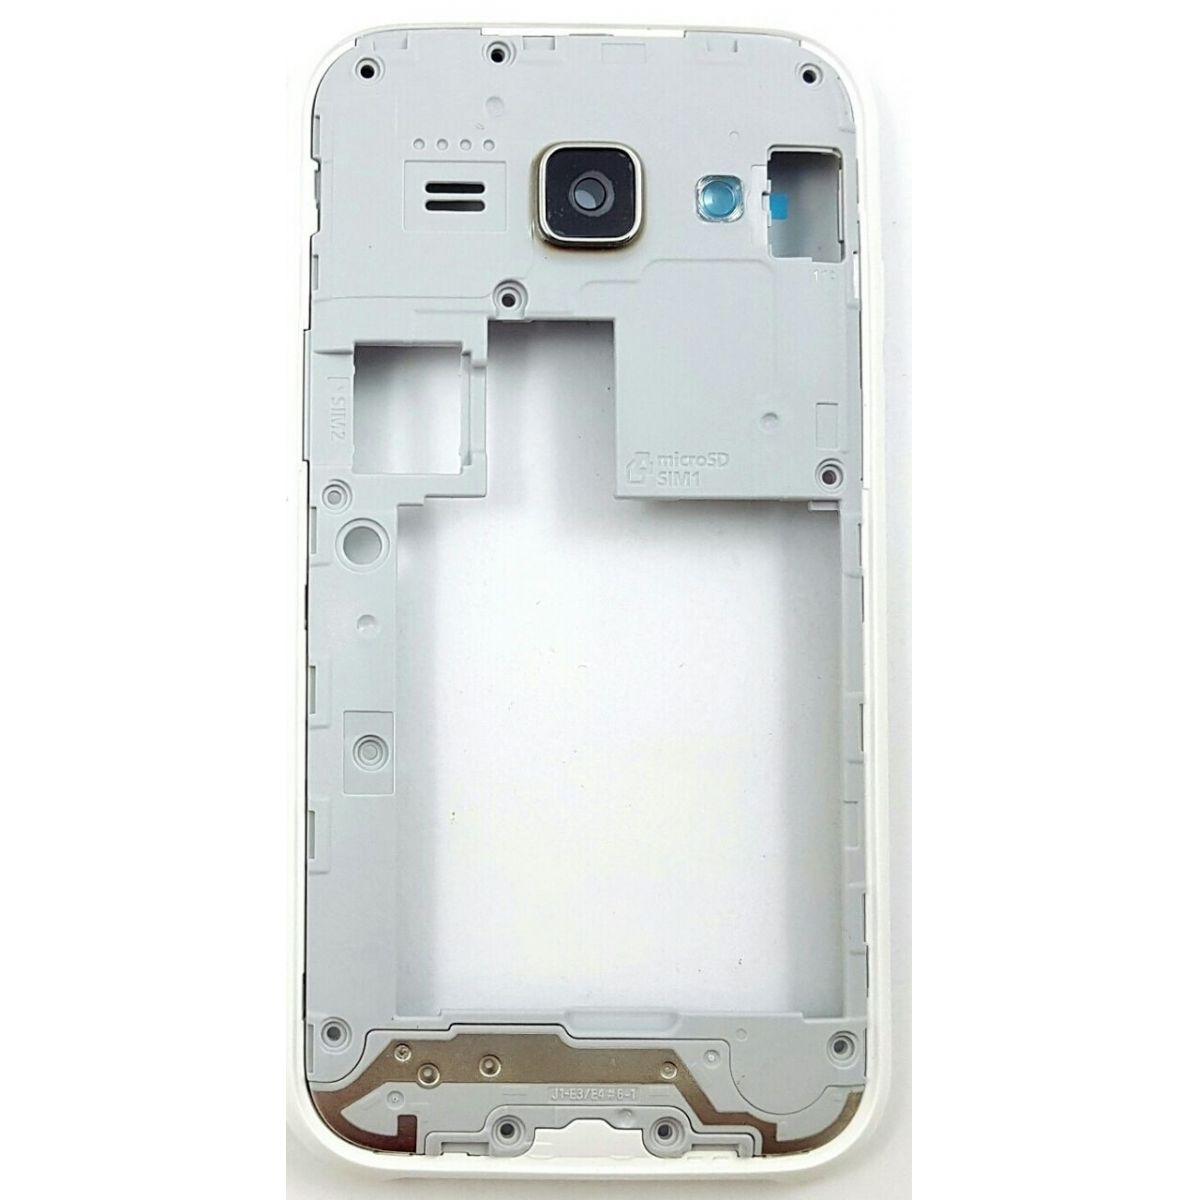 Carcaça Aro Samsung J1 Ace J110 Branco